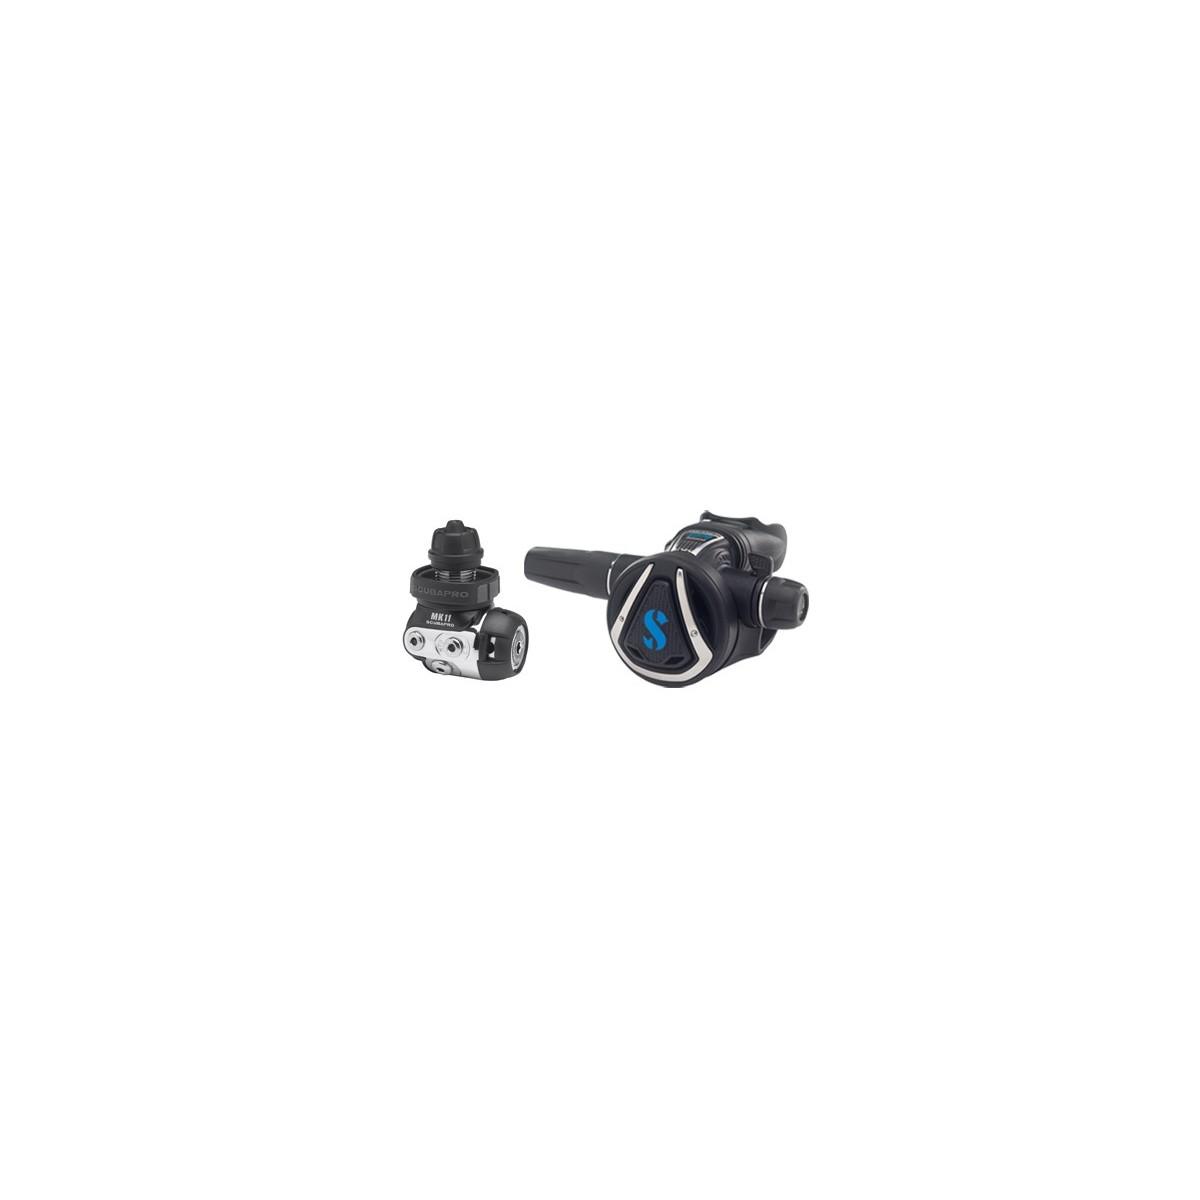 Scubapro Mk11/C350 Regulator